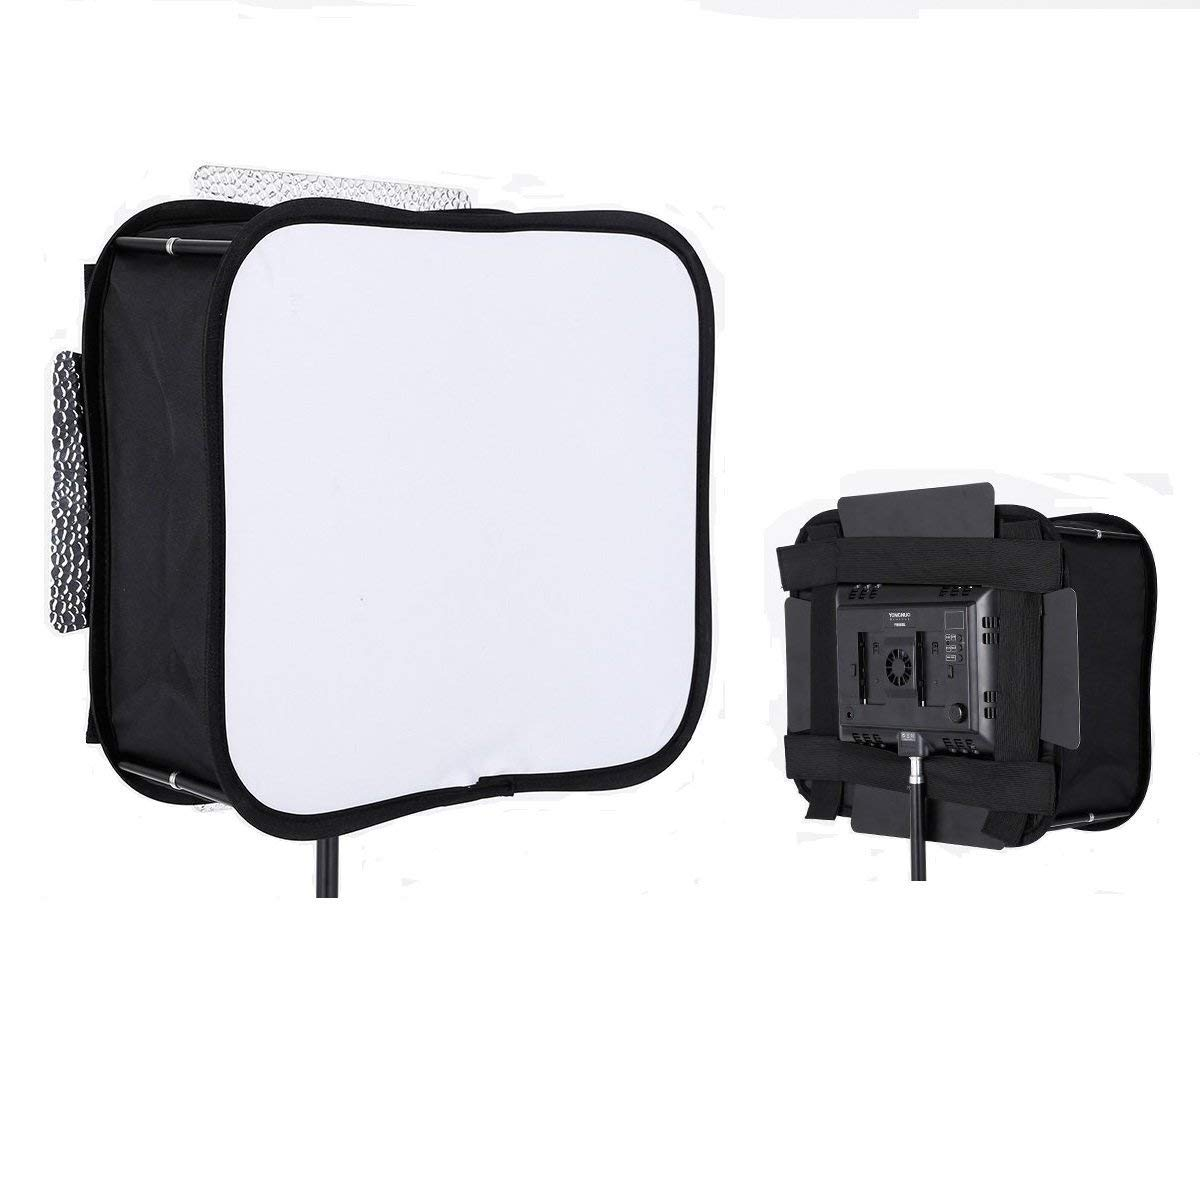 SB300 Softbox Diffuser for YONGNUO YN300 III YN-300 II LED Video Light Panel Foldable Portable Soft Filter Ulanzi